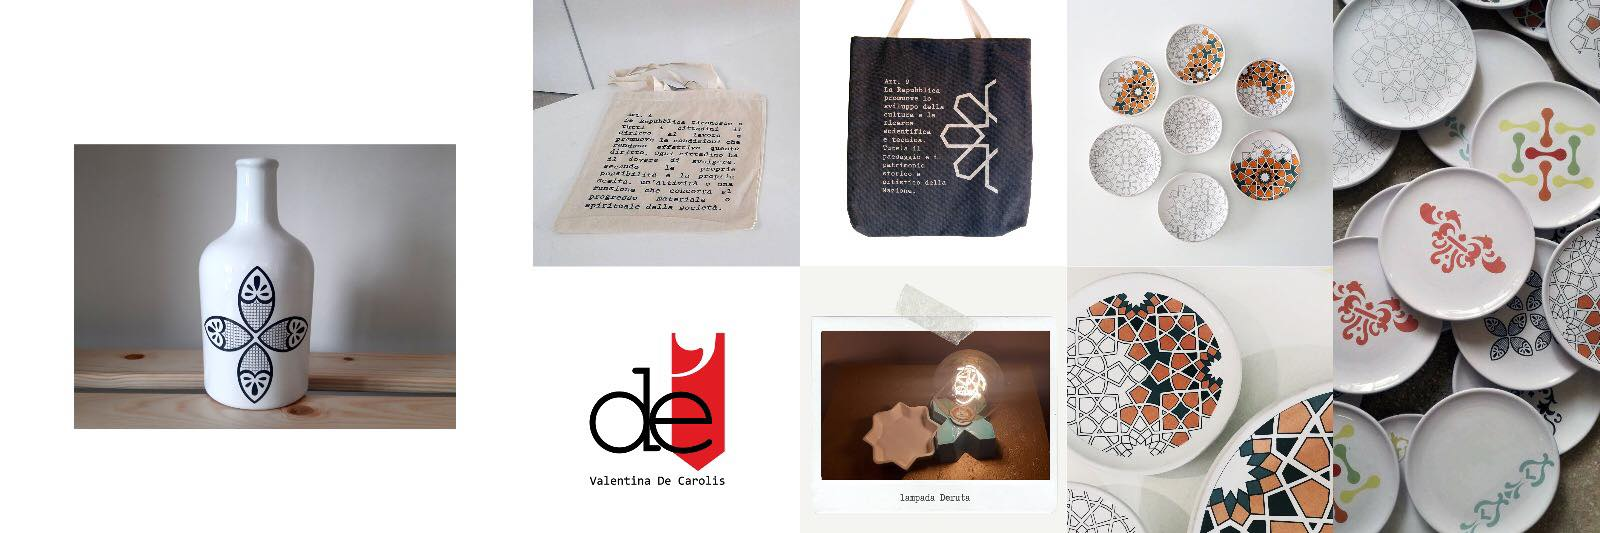 ceramics, Valentina De Carolis